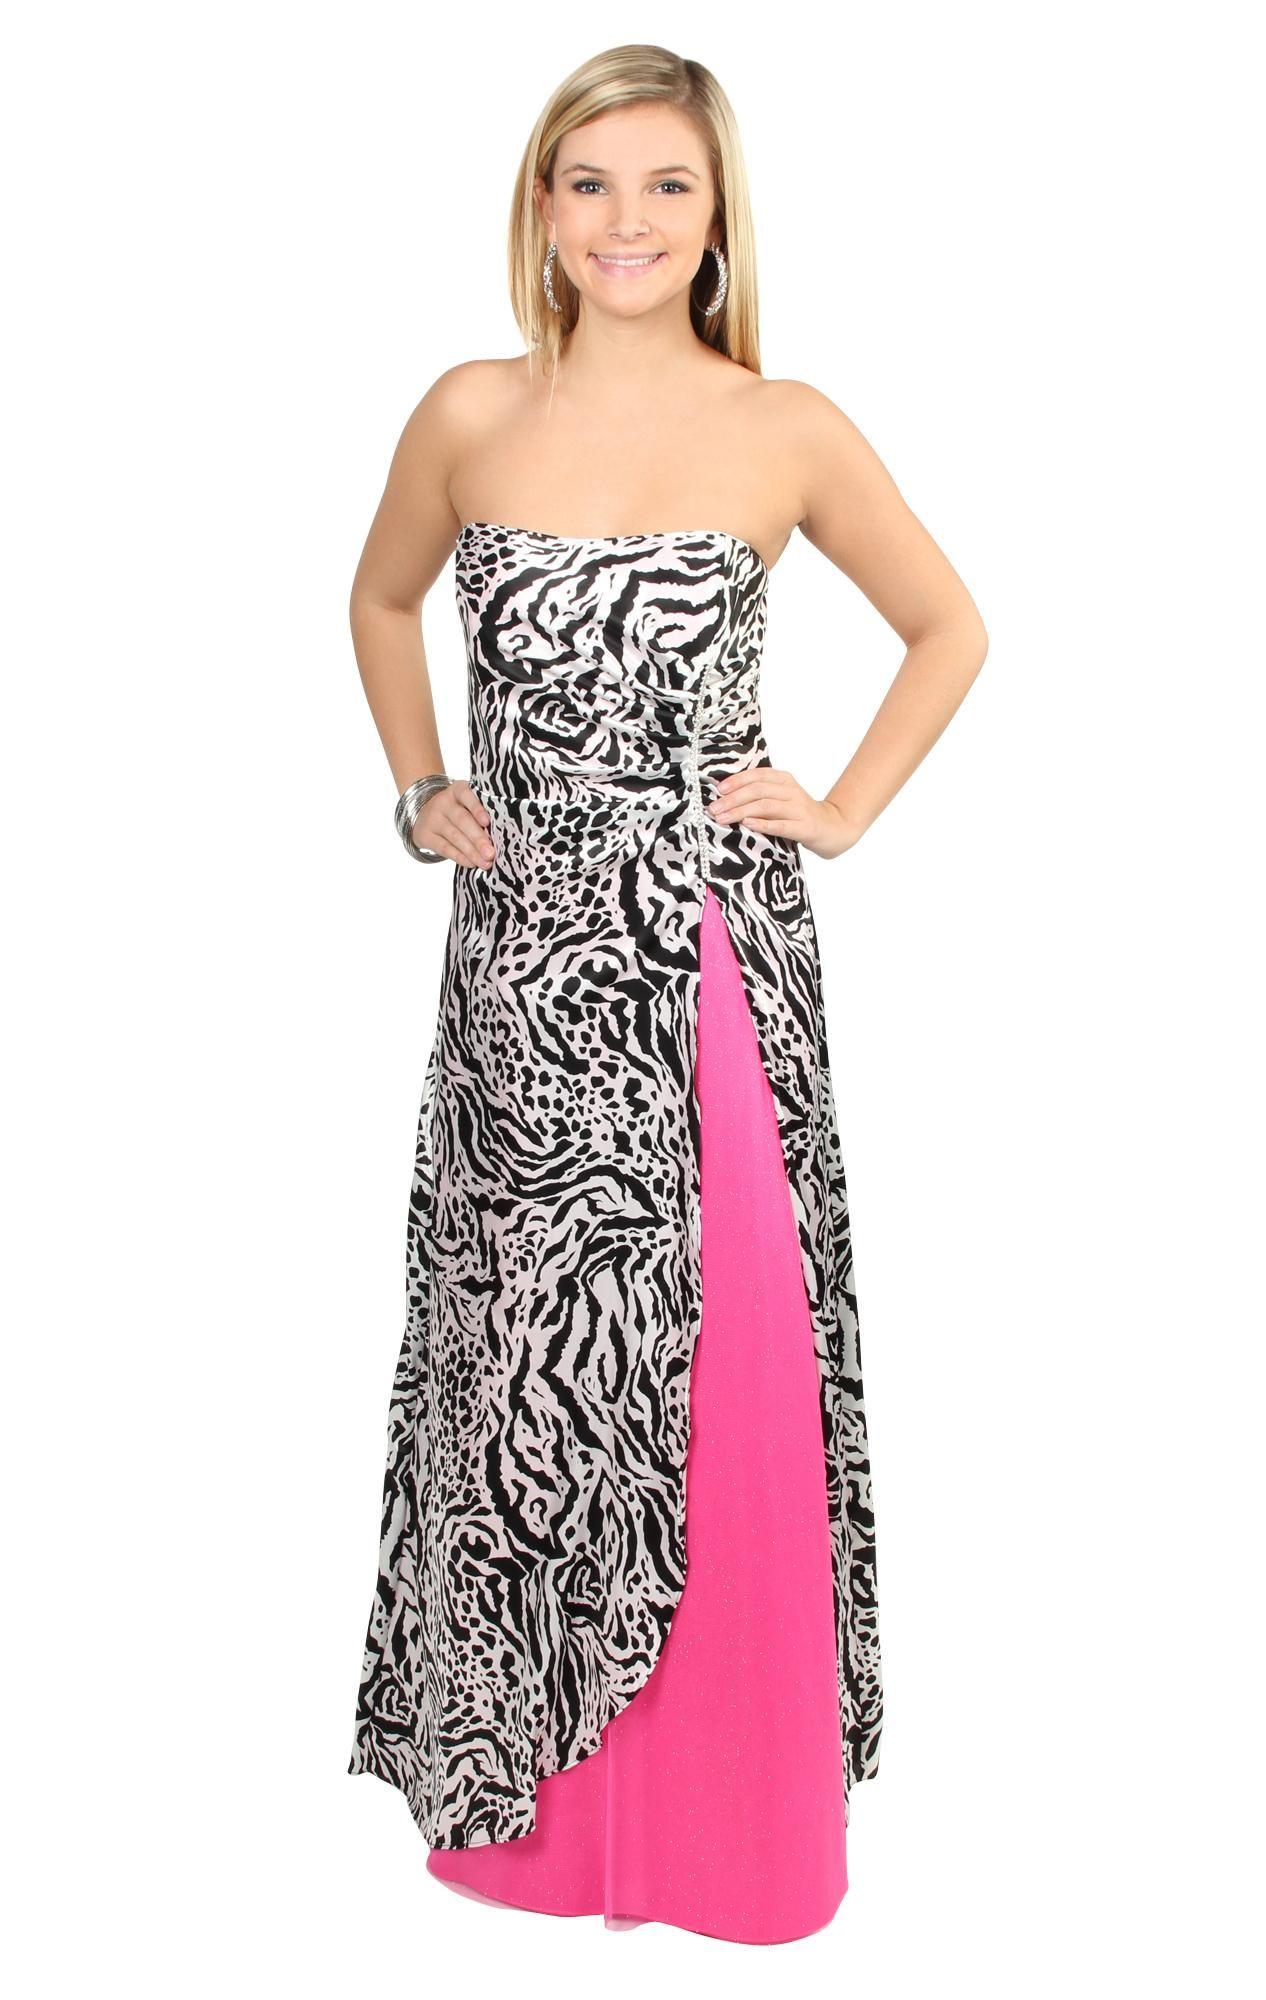 Strapless zebra print prom dress